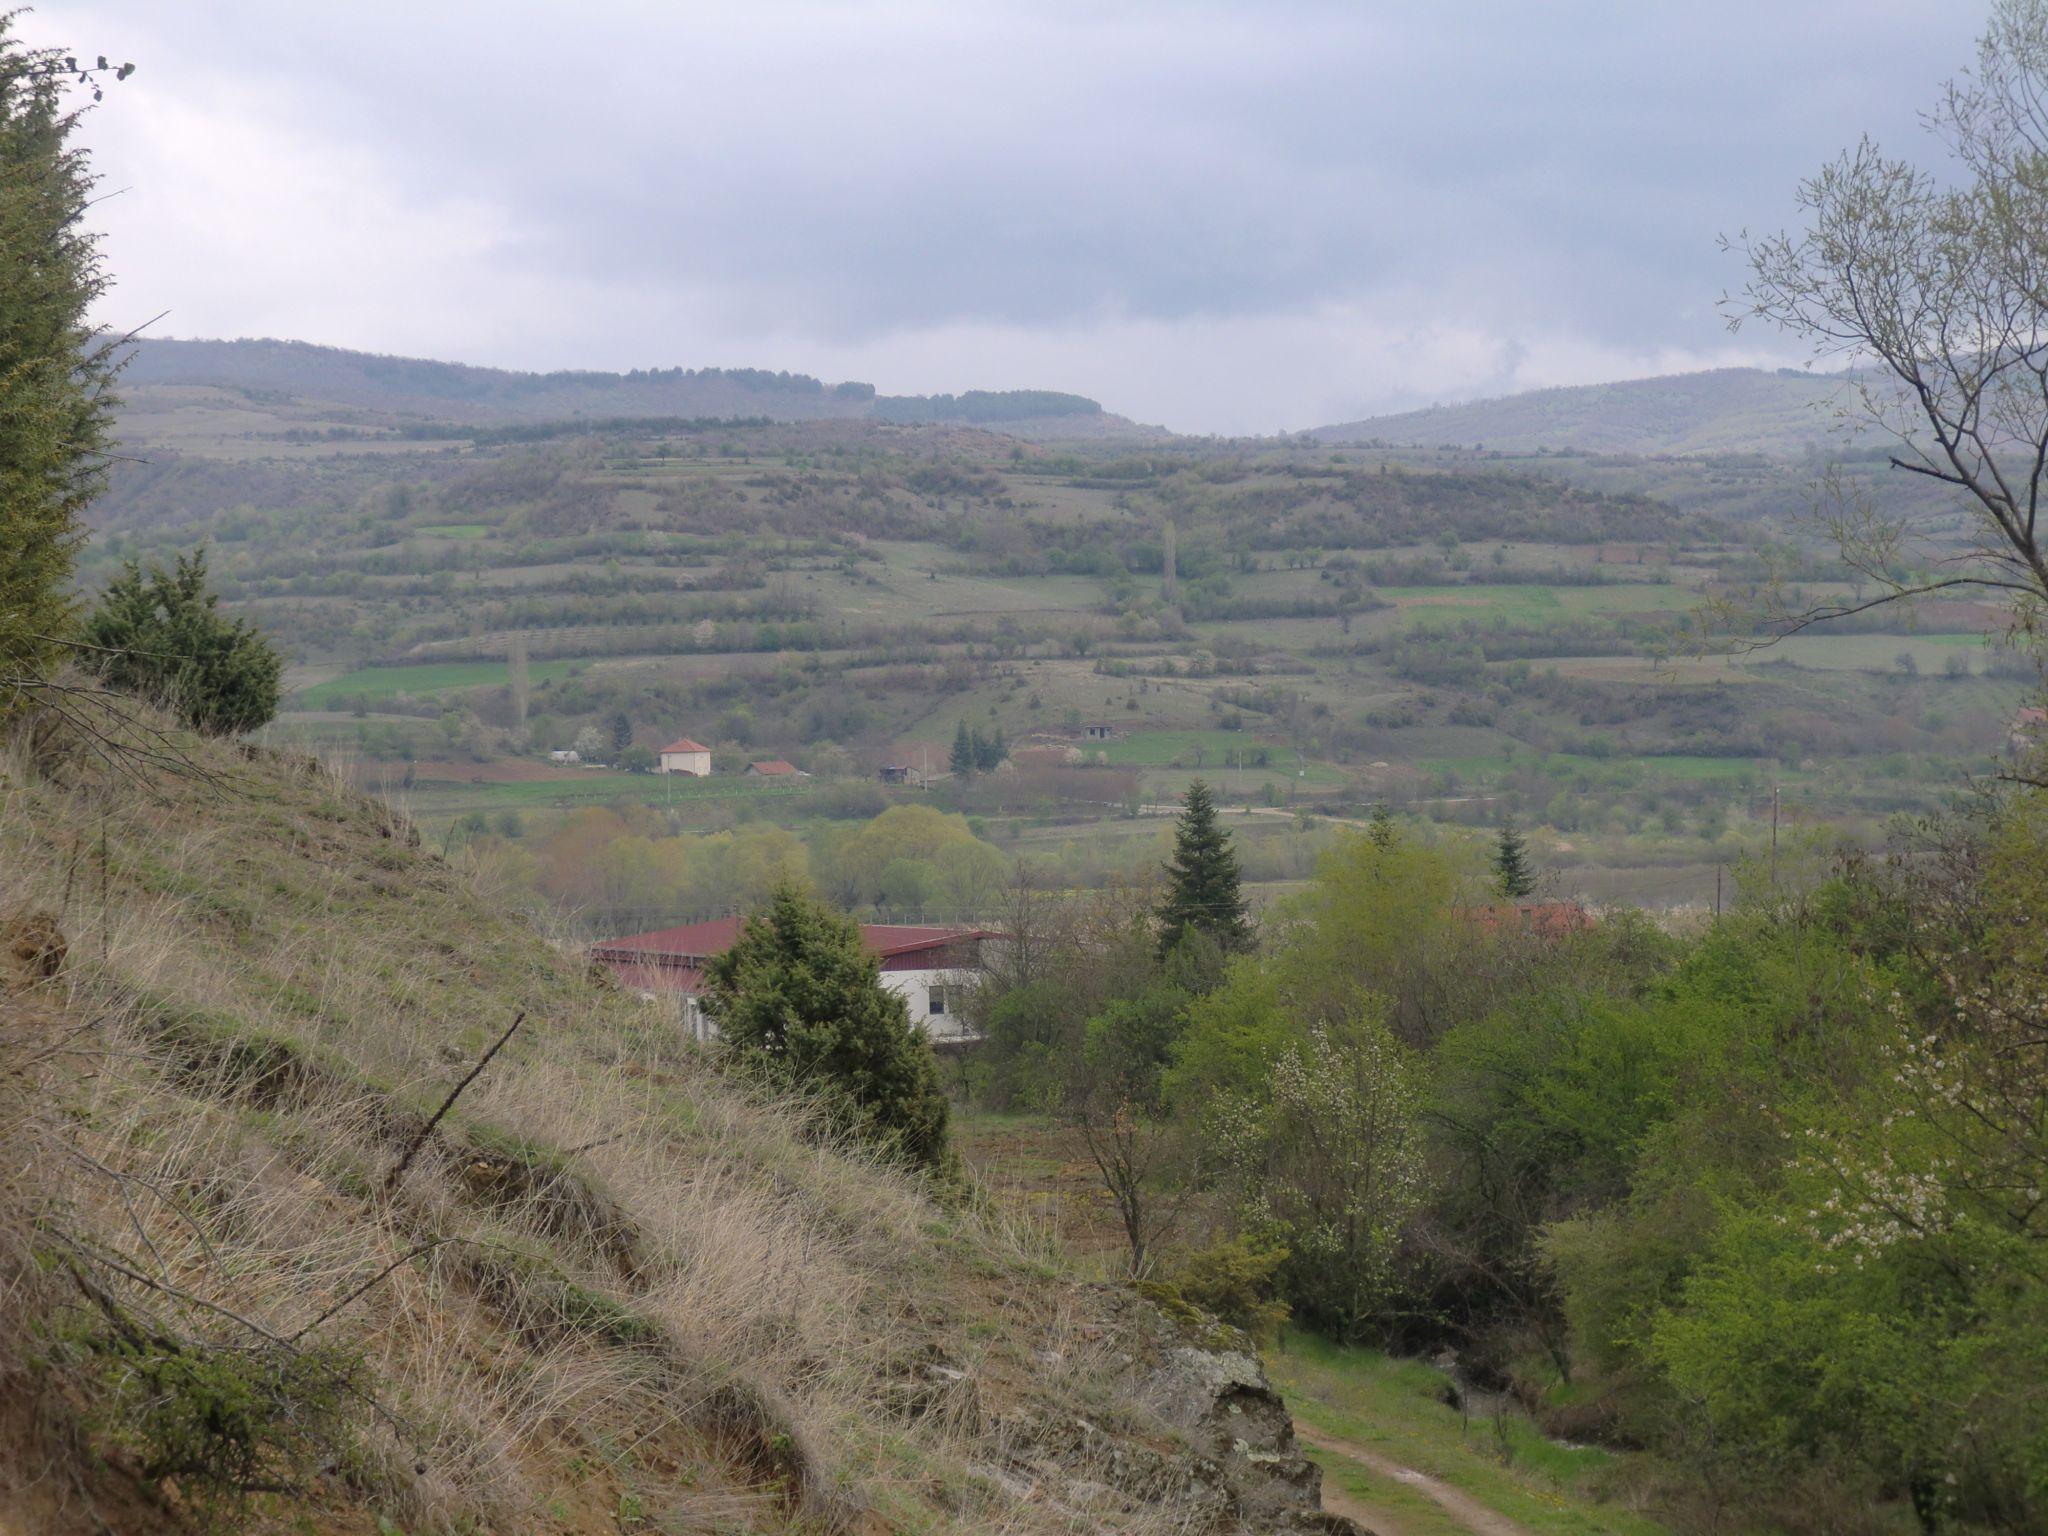 CIMG4358 - Macedonian landscapes